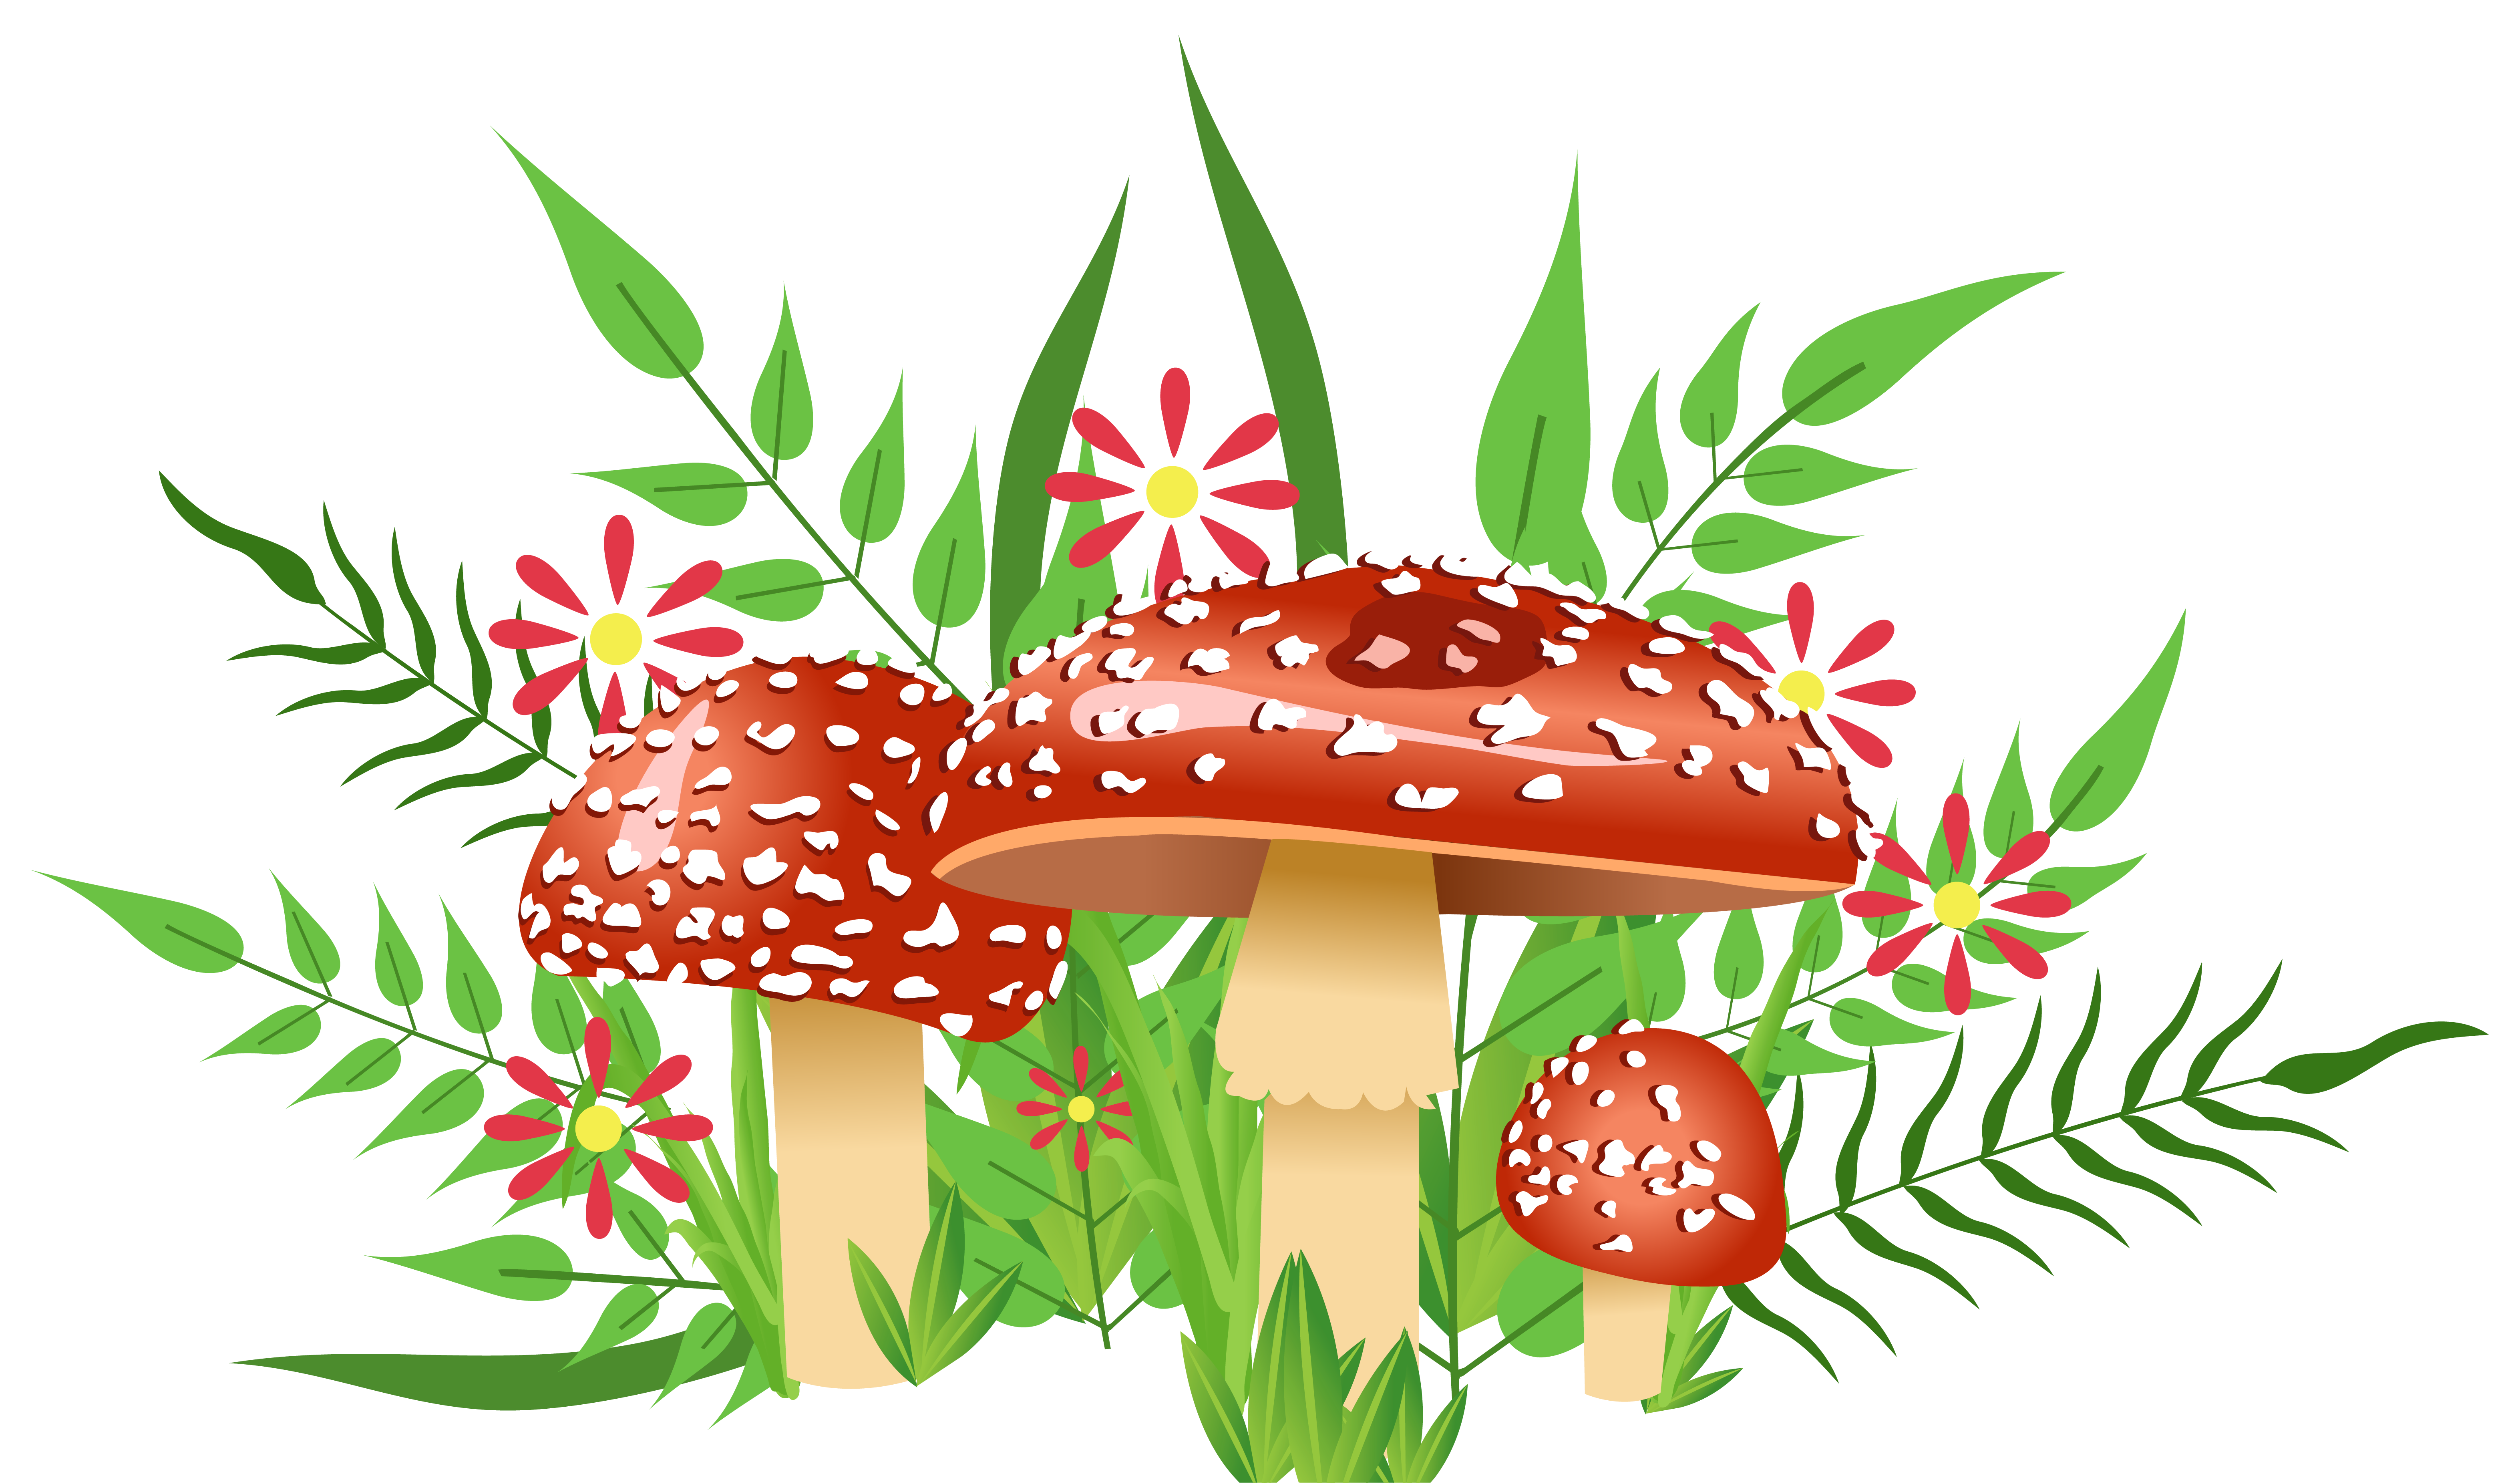 Clipart summer element. Mushrooms decorative png image